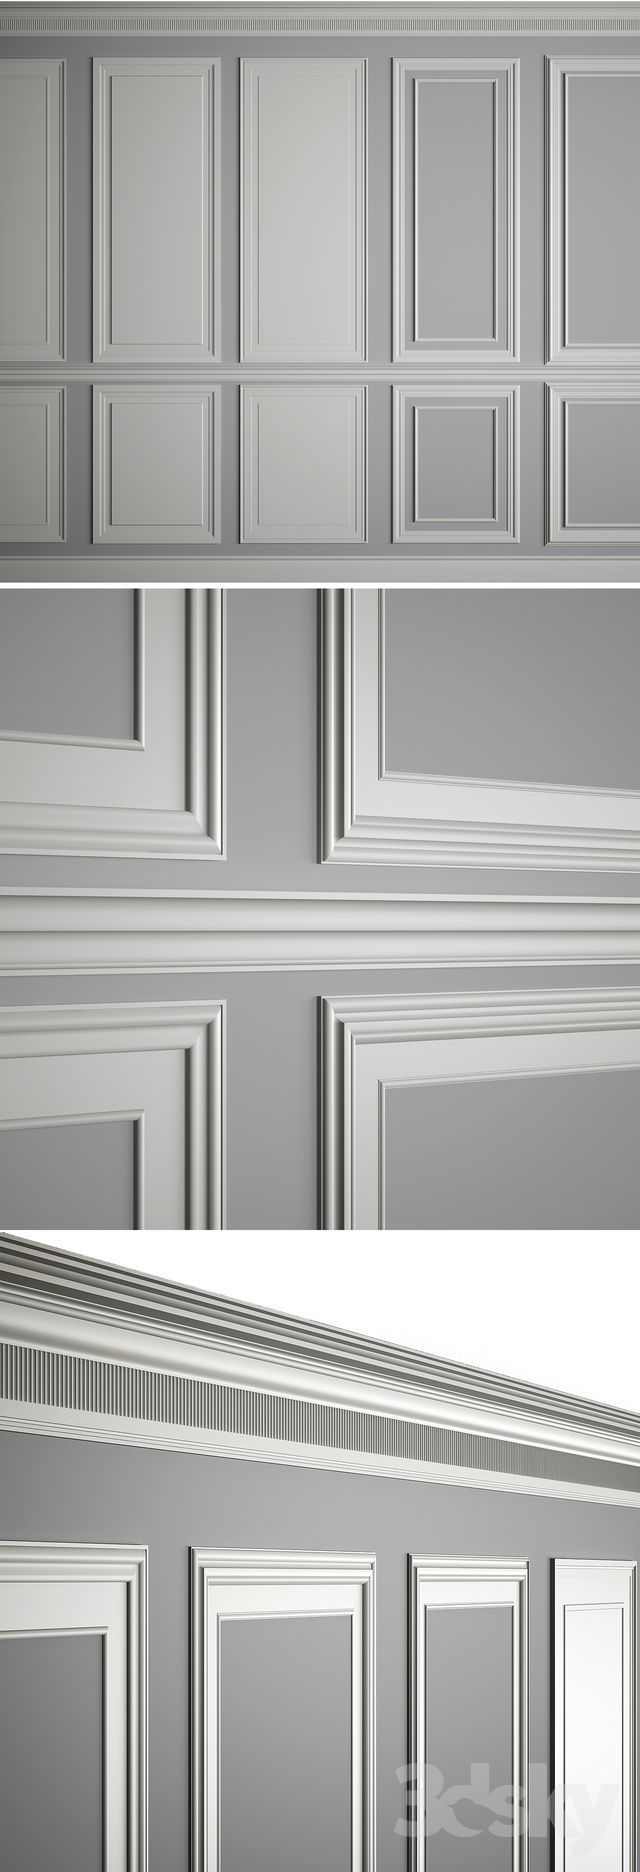 3d Models Decorative Plaster Moldings On The Walls Zimmerdecke Verputzen Zimmerdecke Paneele Zimme Haus Deko Klassische Inneneinrichtung Innenverkleidung